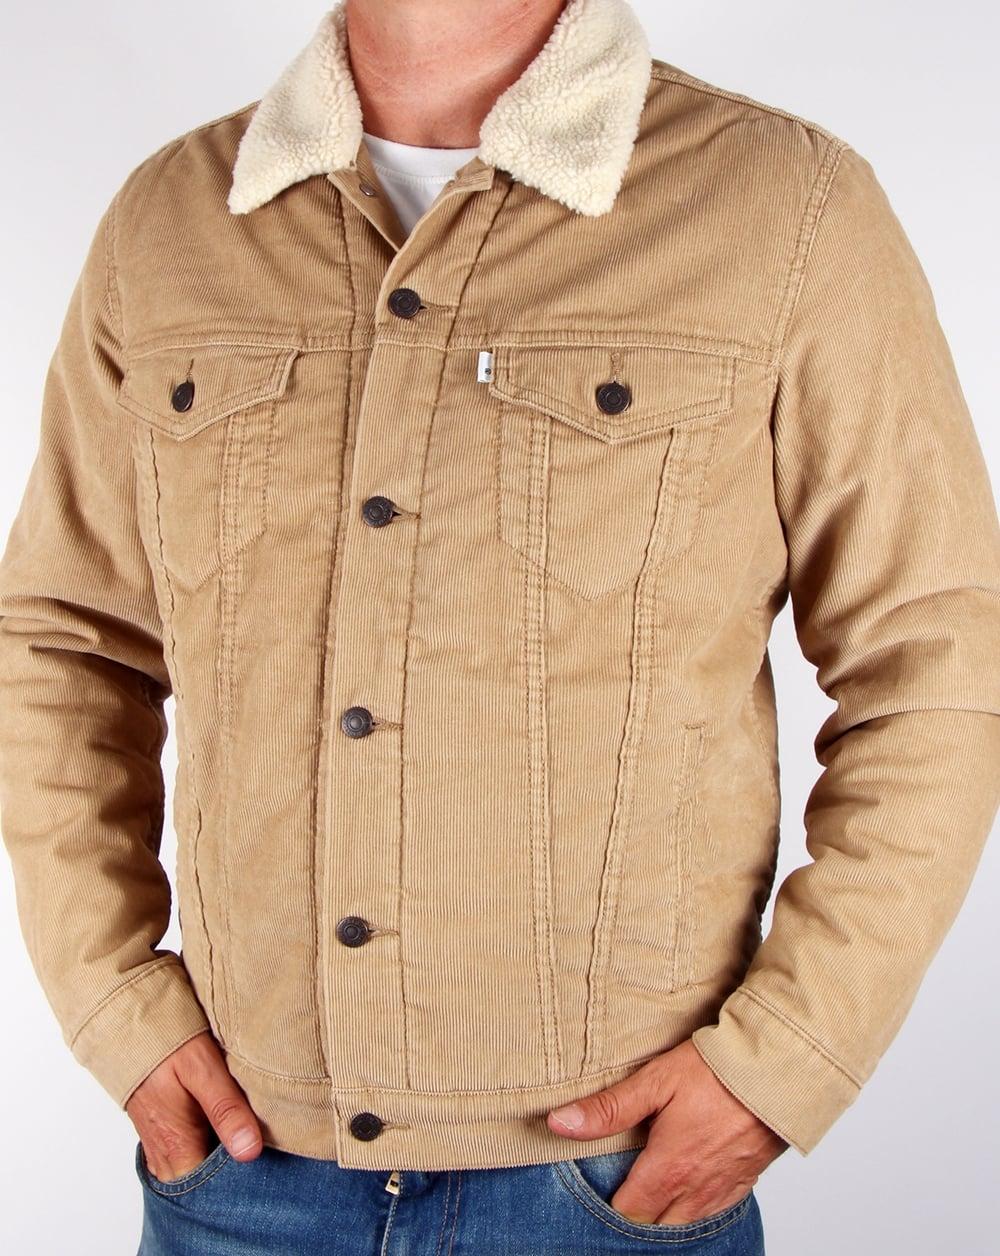 ff333fa8d6fb Levis Corduroy Sherpa Trucker Jacket Chino,Men's,Coat,Jeans